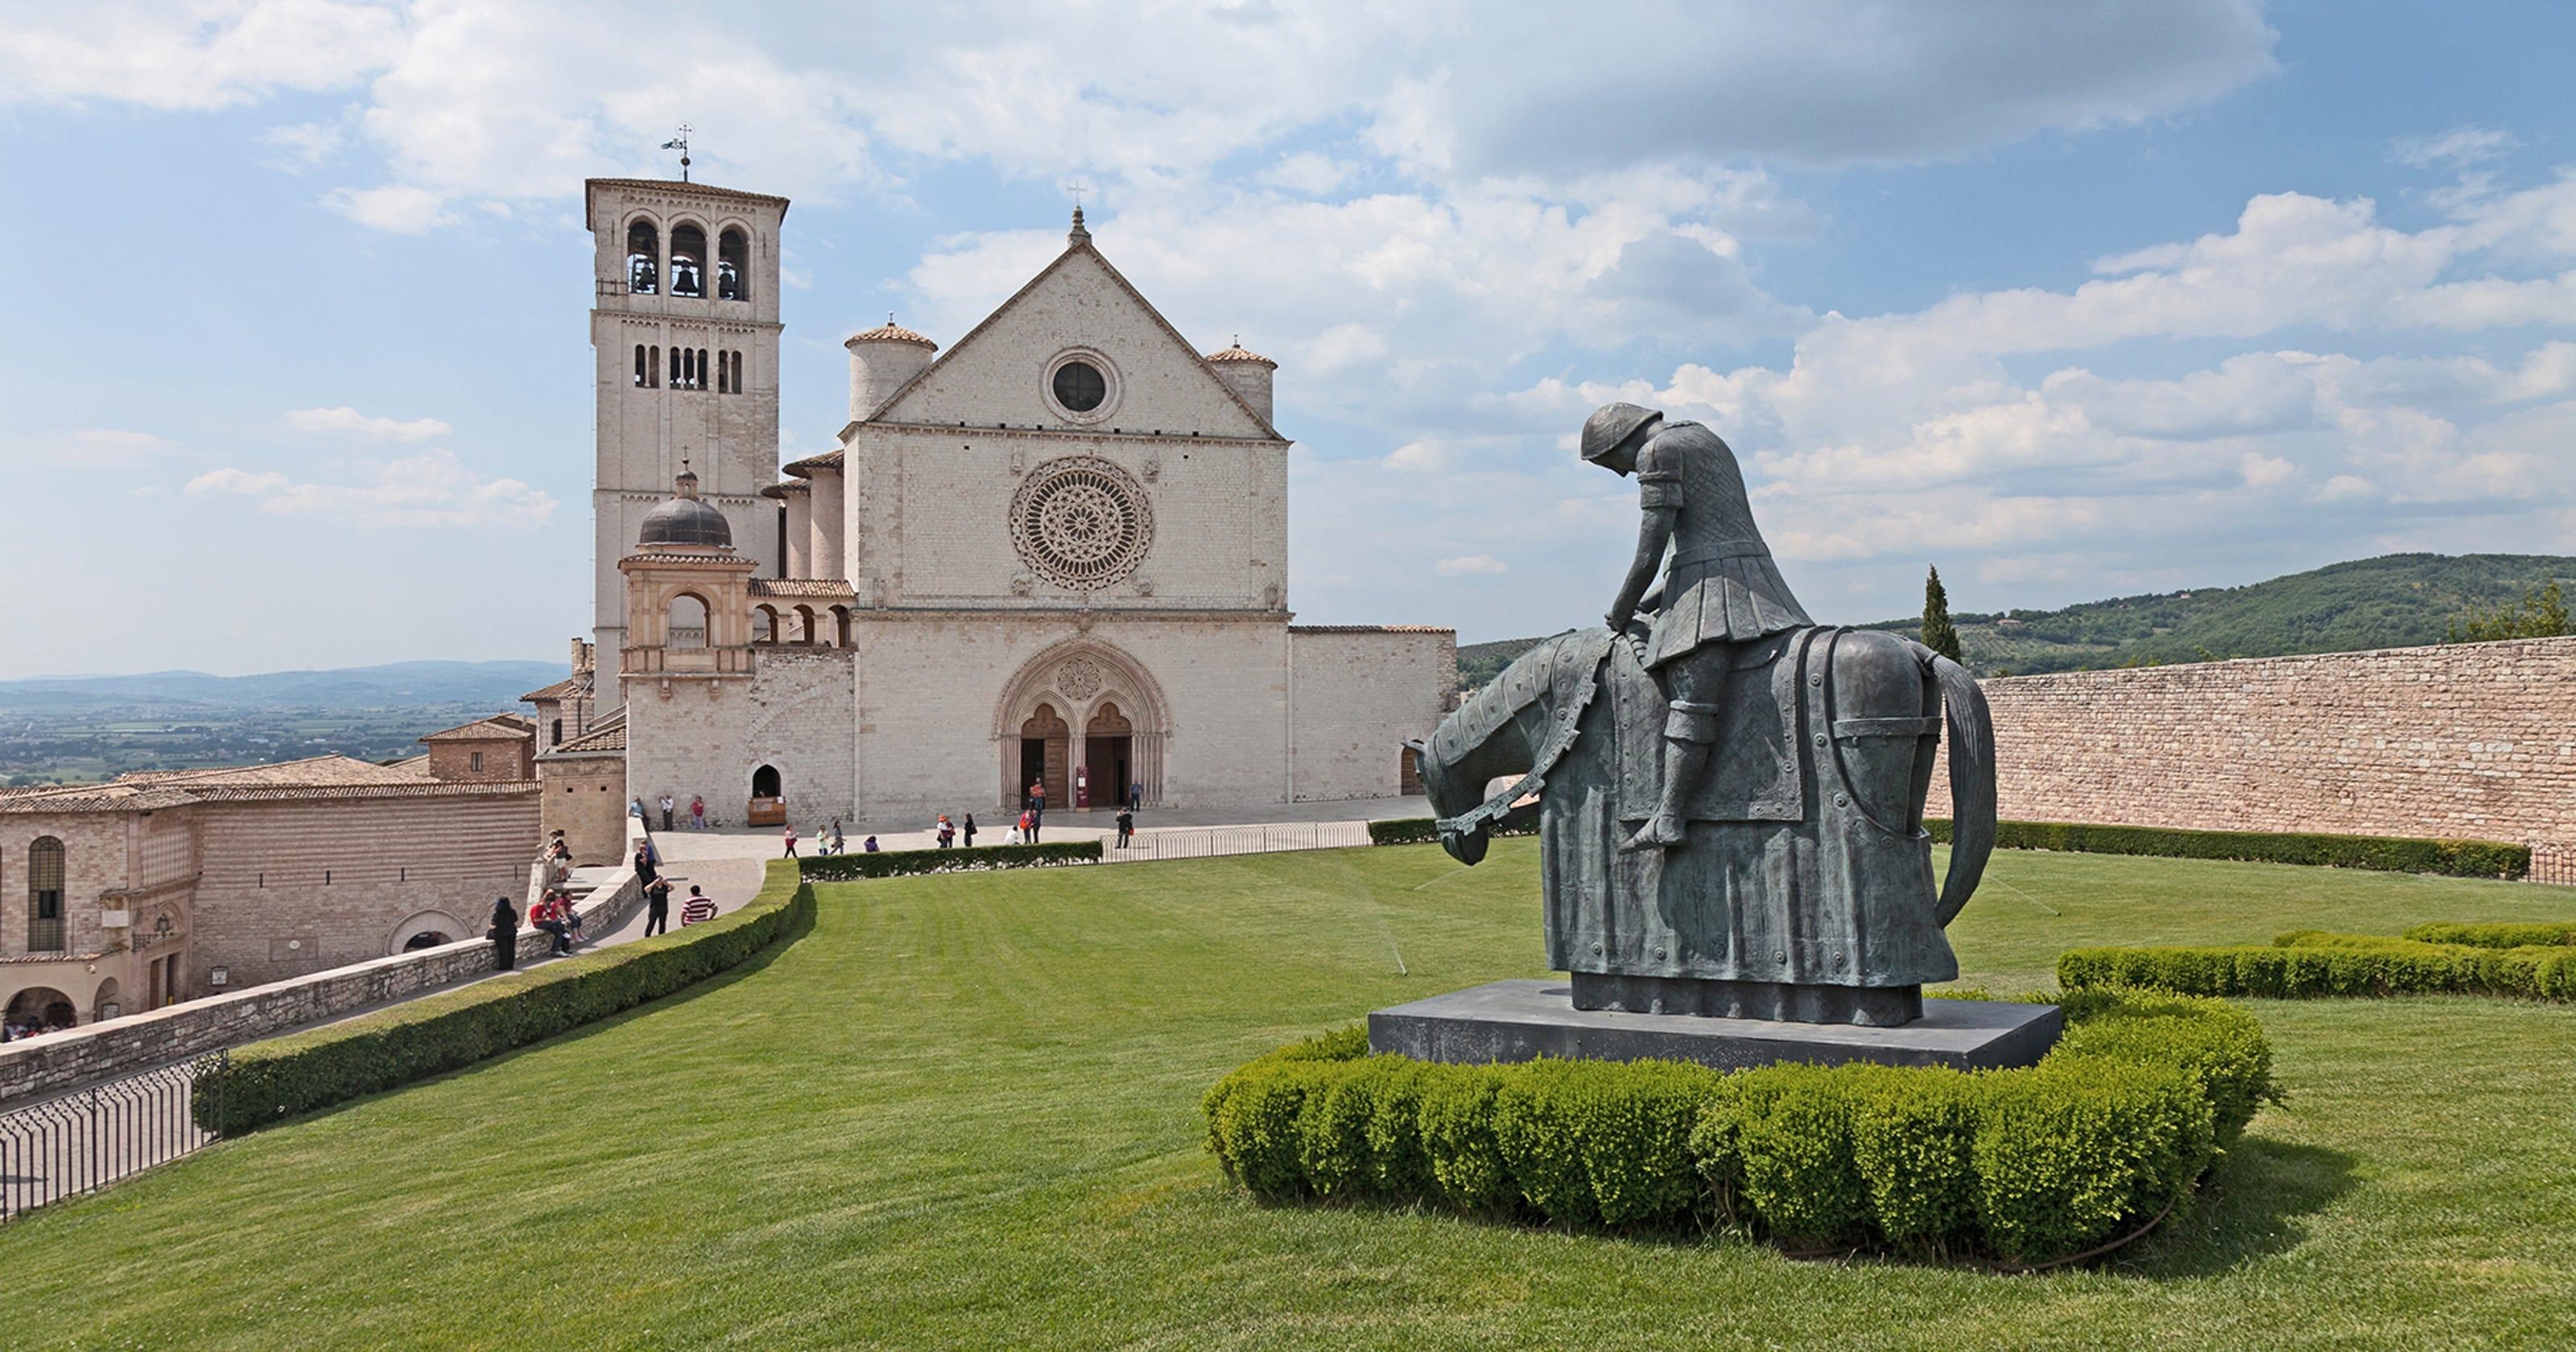 Saint Francis vs. Martin Luther